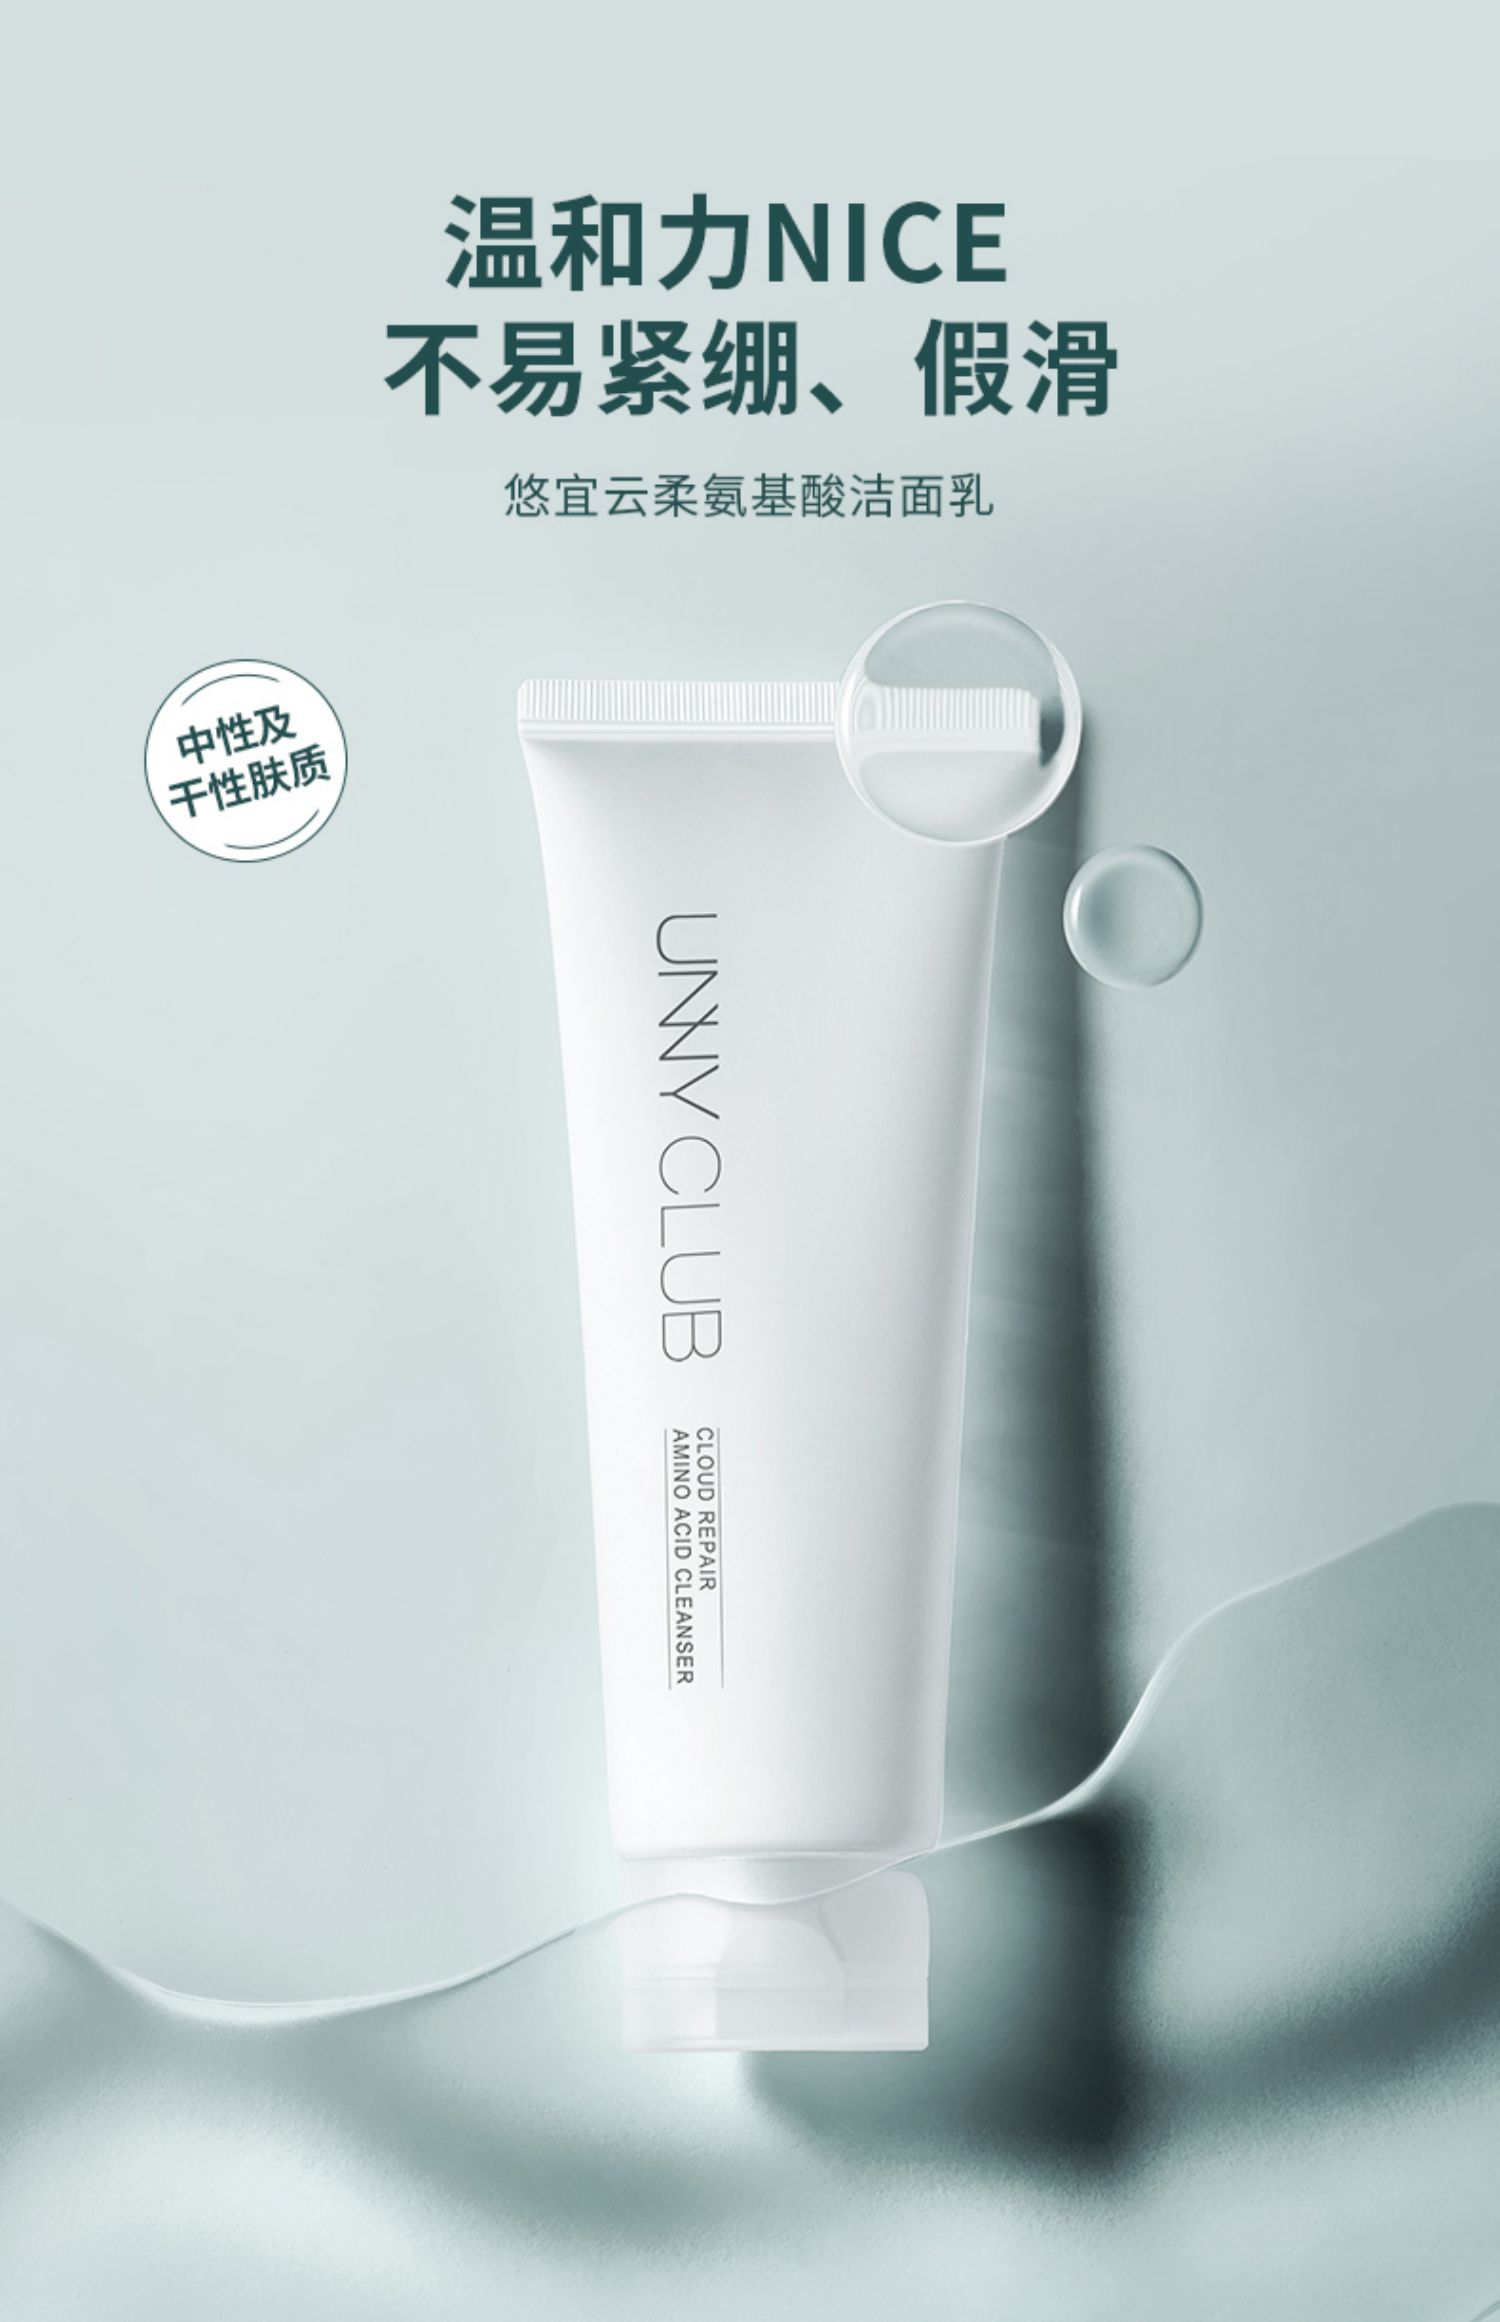 【unny】官旗氨基酸洗面奶120g5